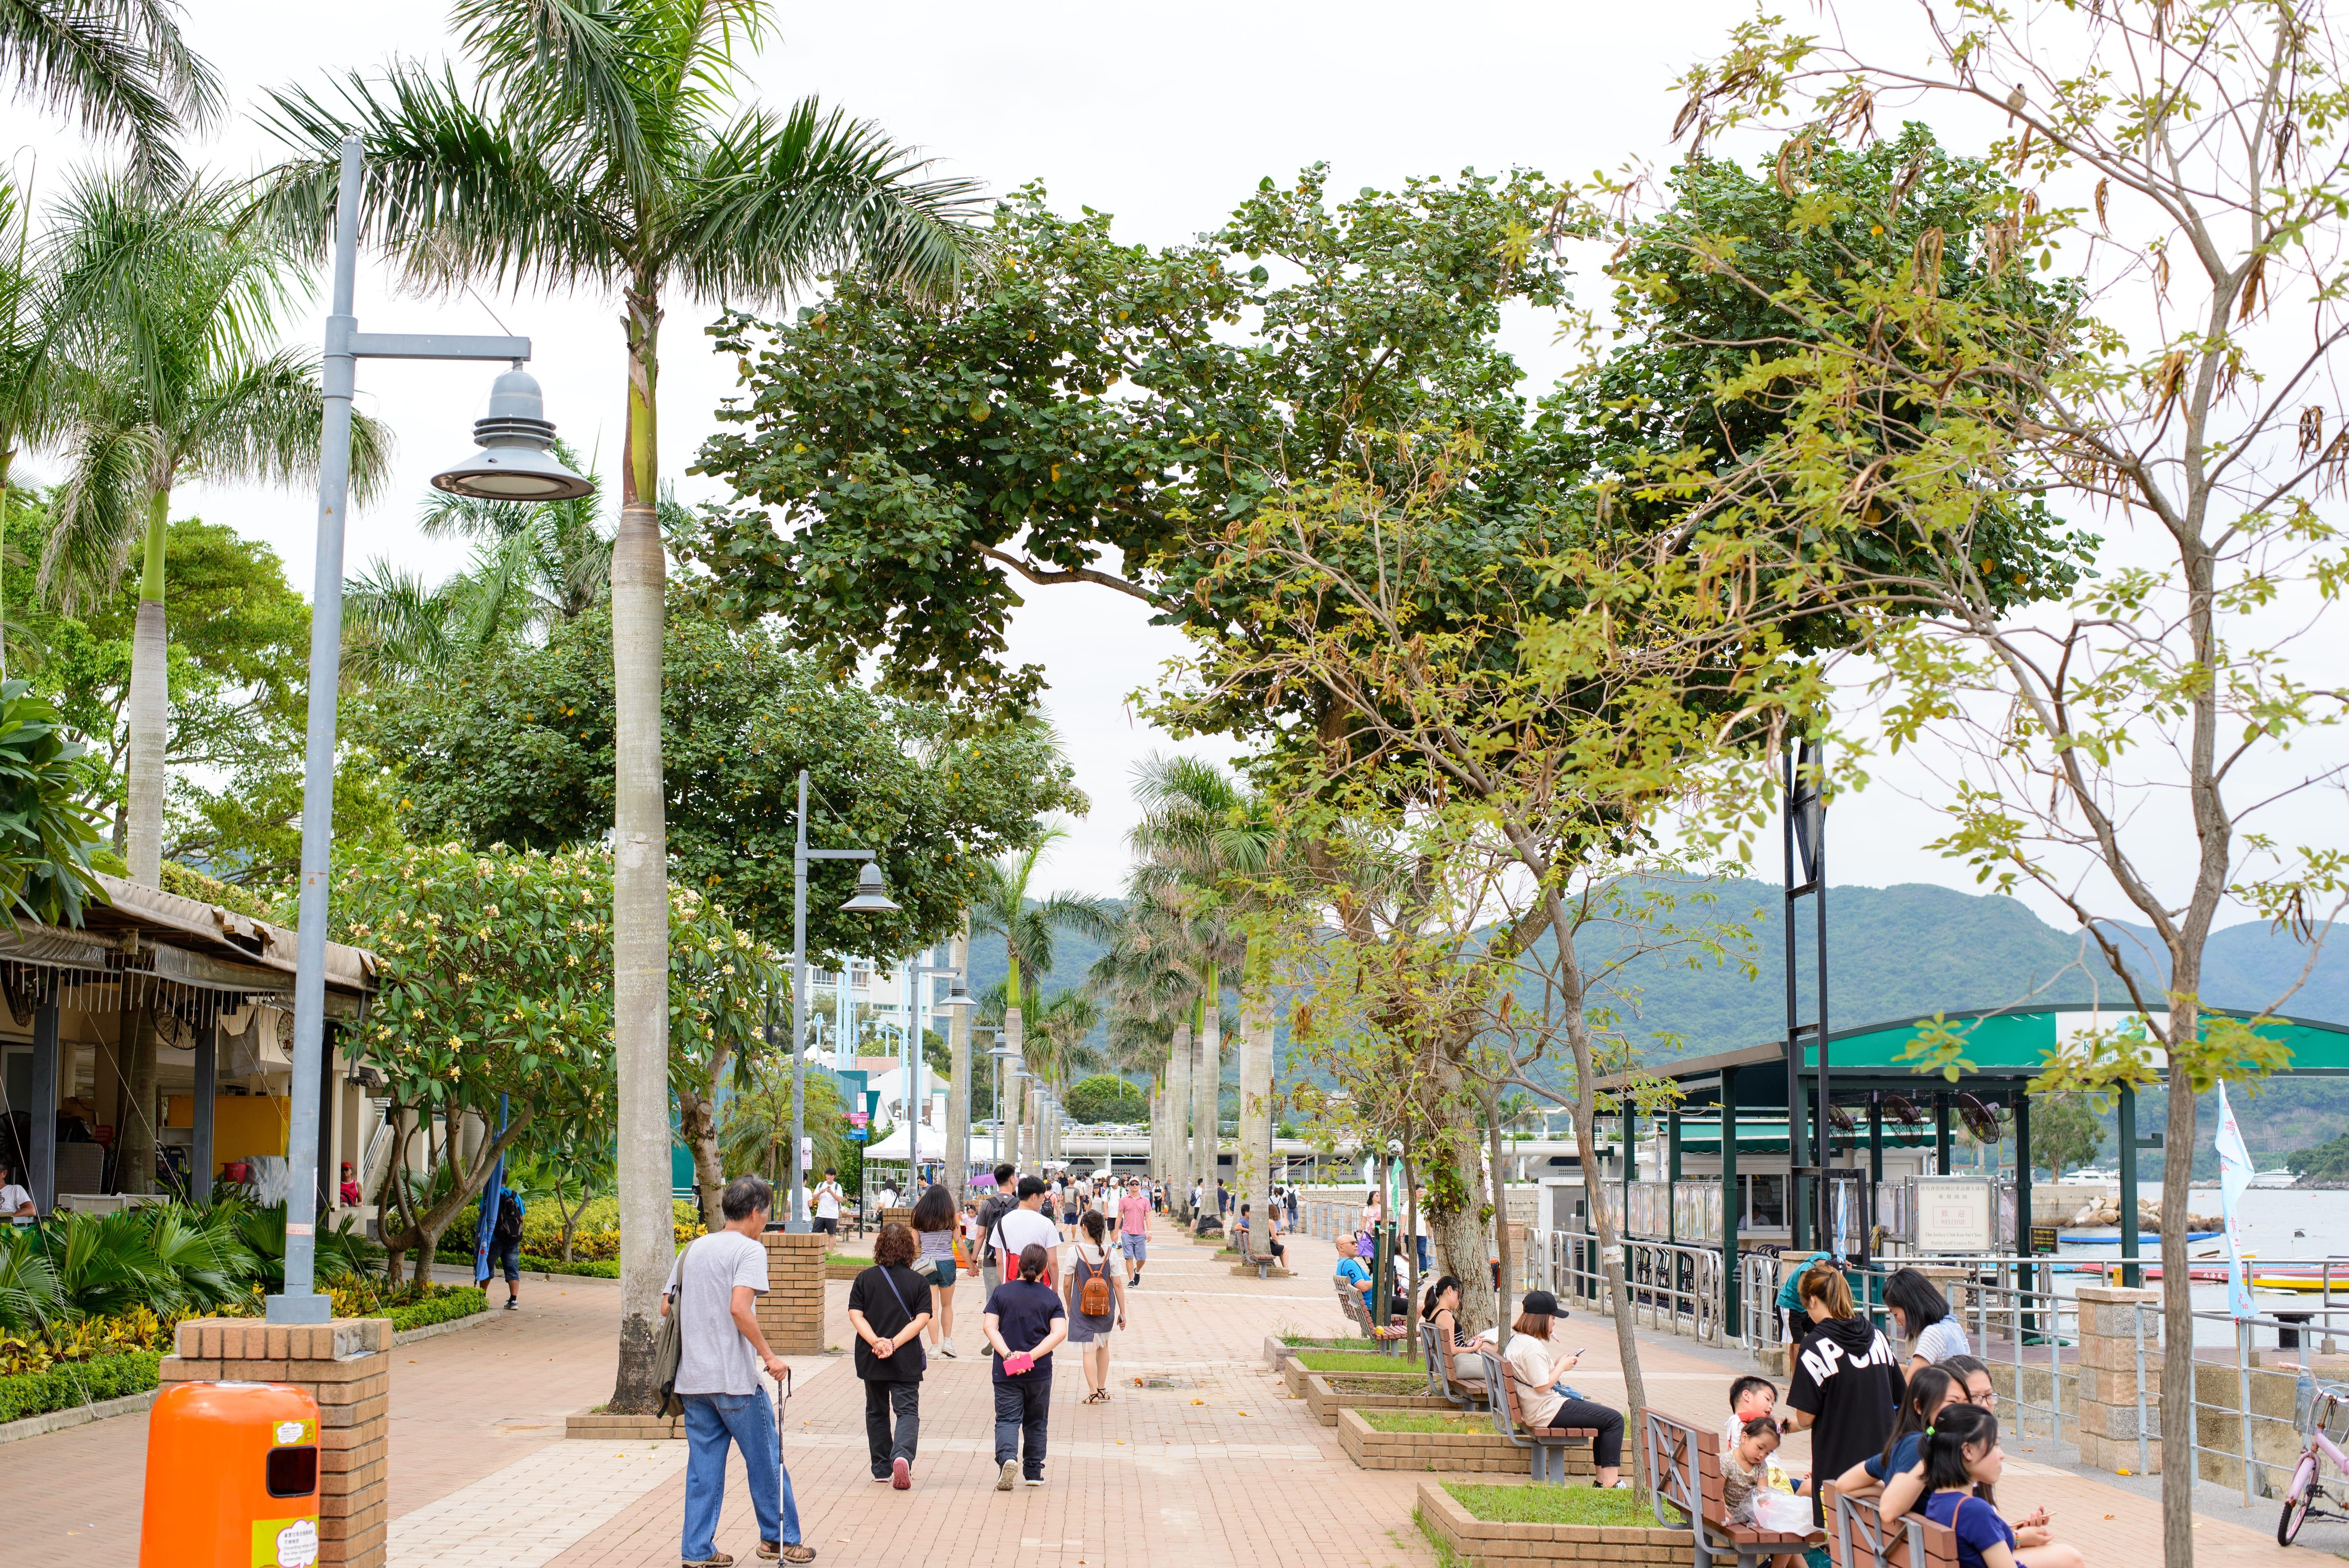 Sai Kung Promenade